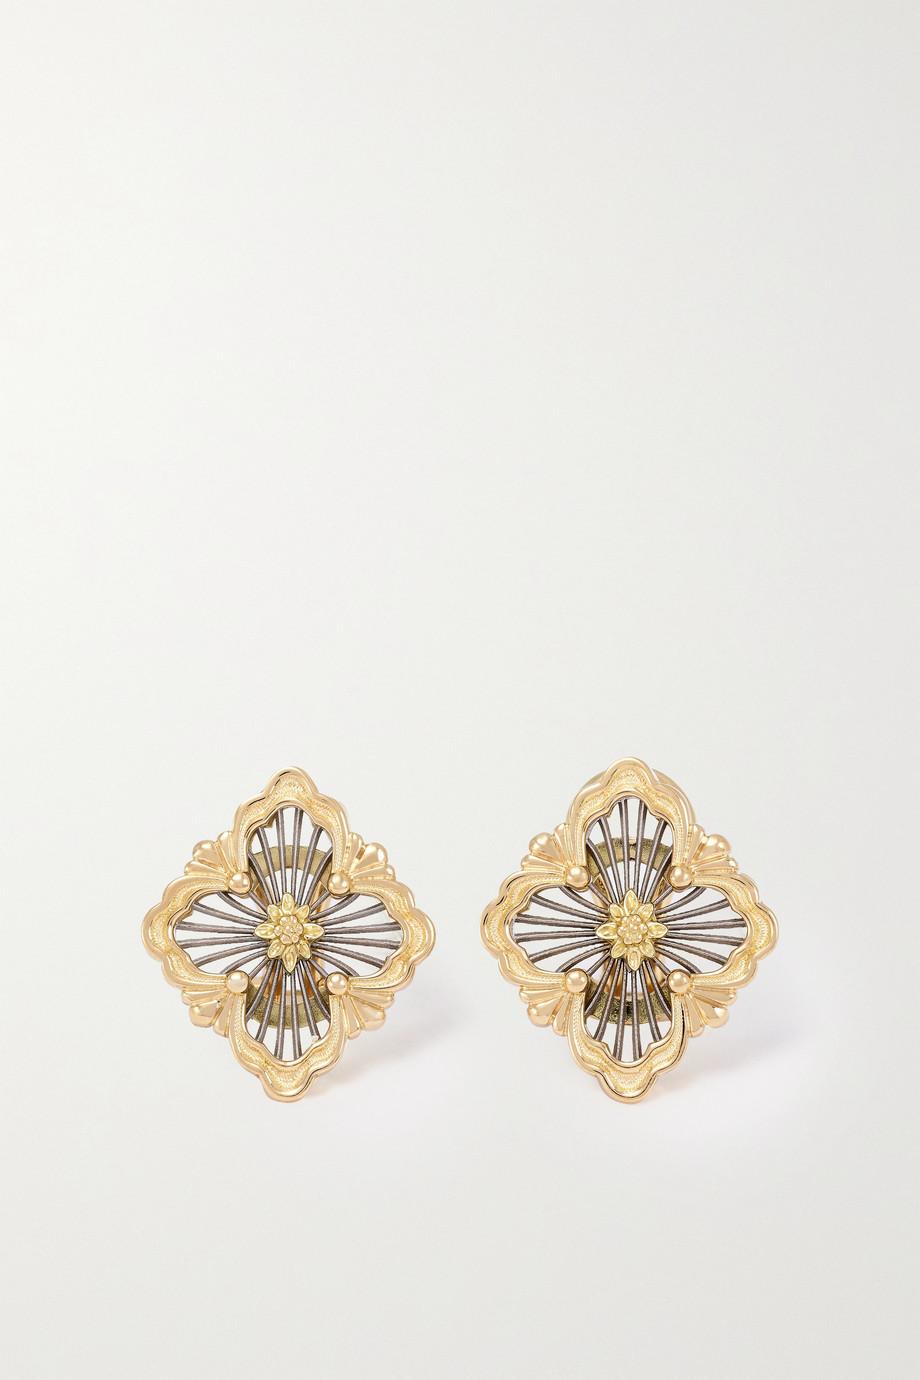 Buccellati Opera Tulle 18-karat yellow and white gold earrings